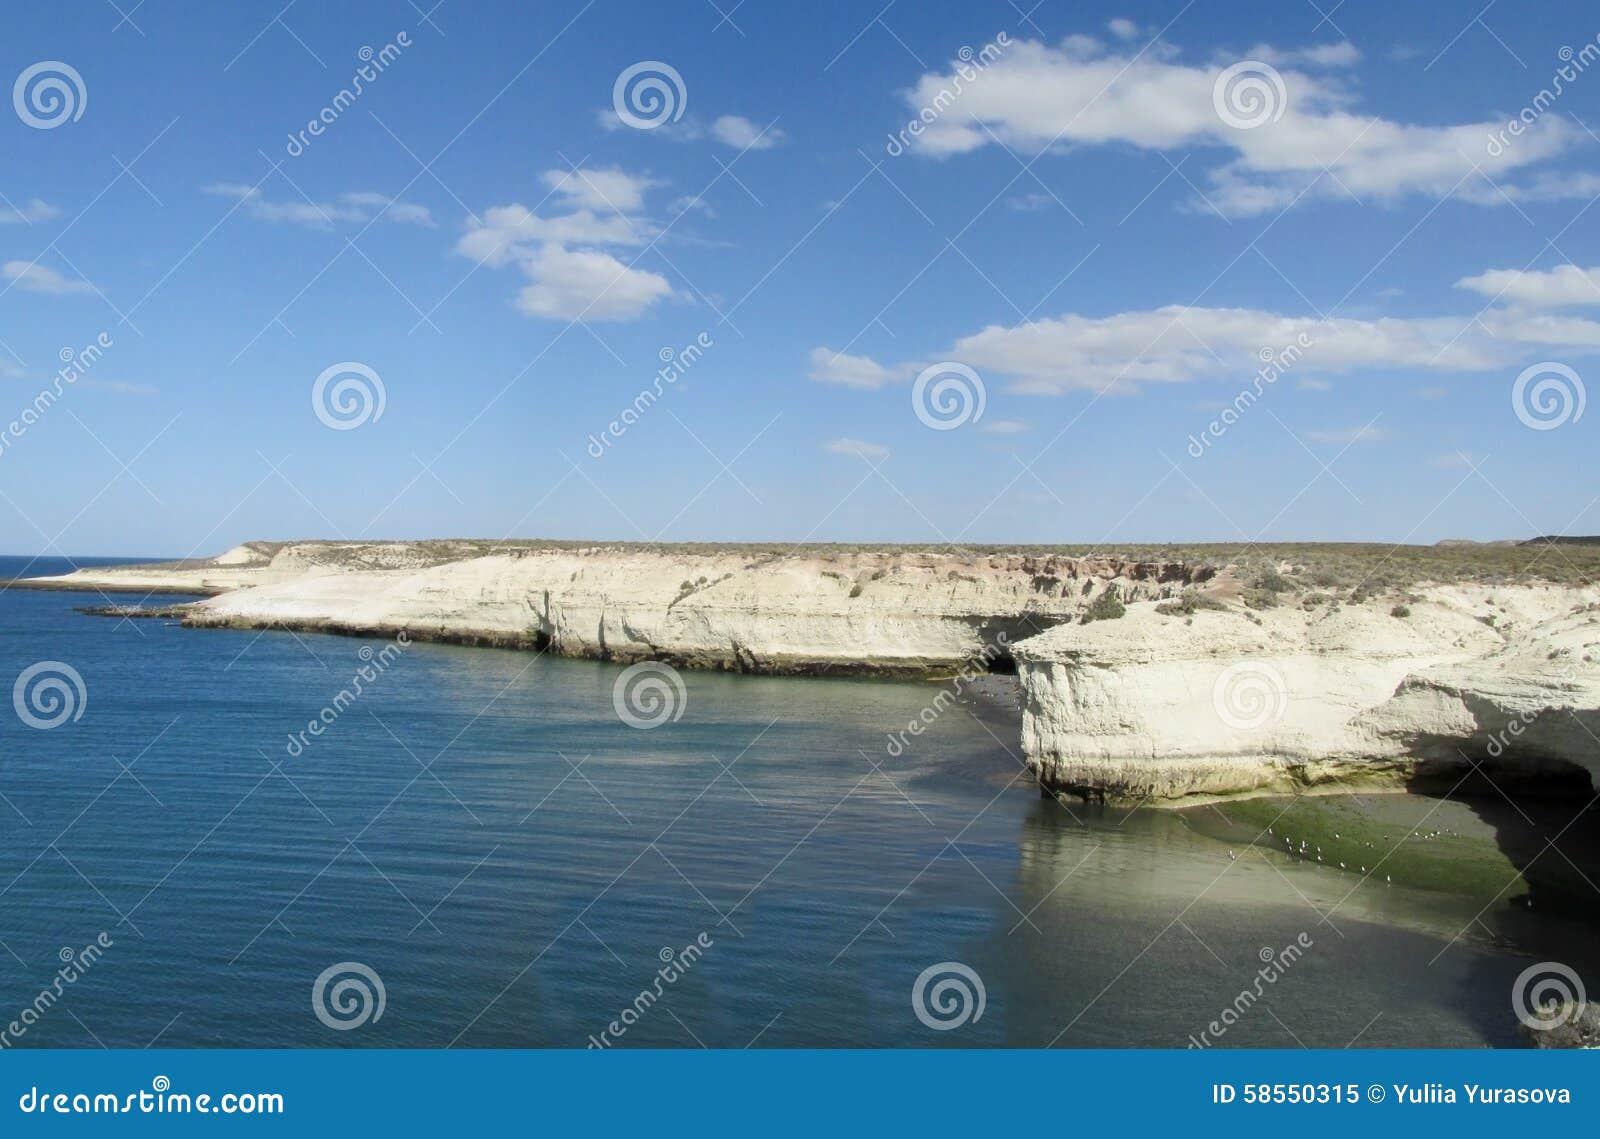 Накидка с белыми скалами в океане